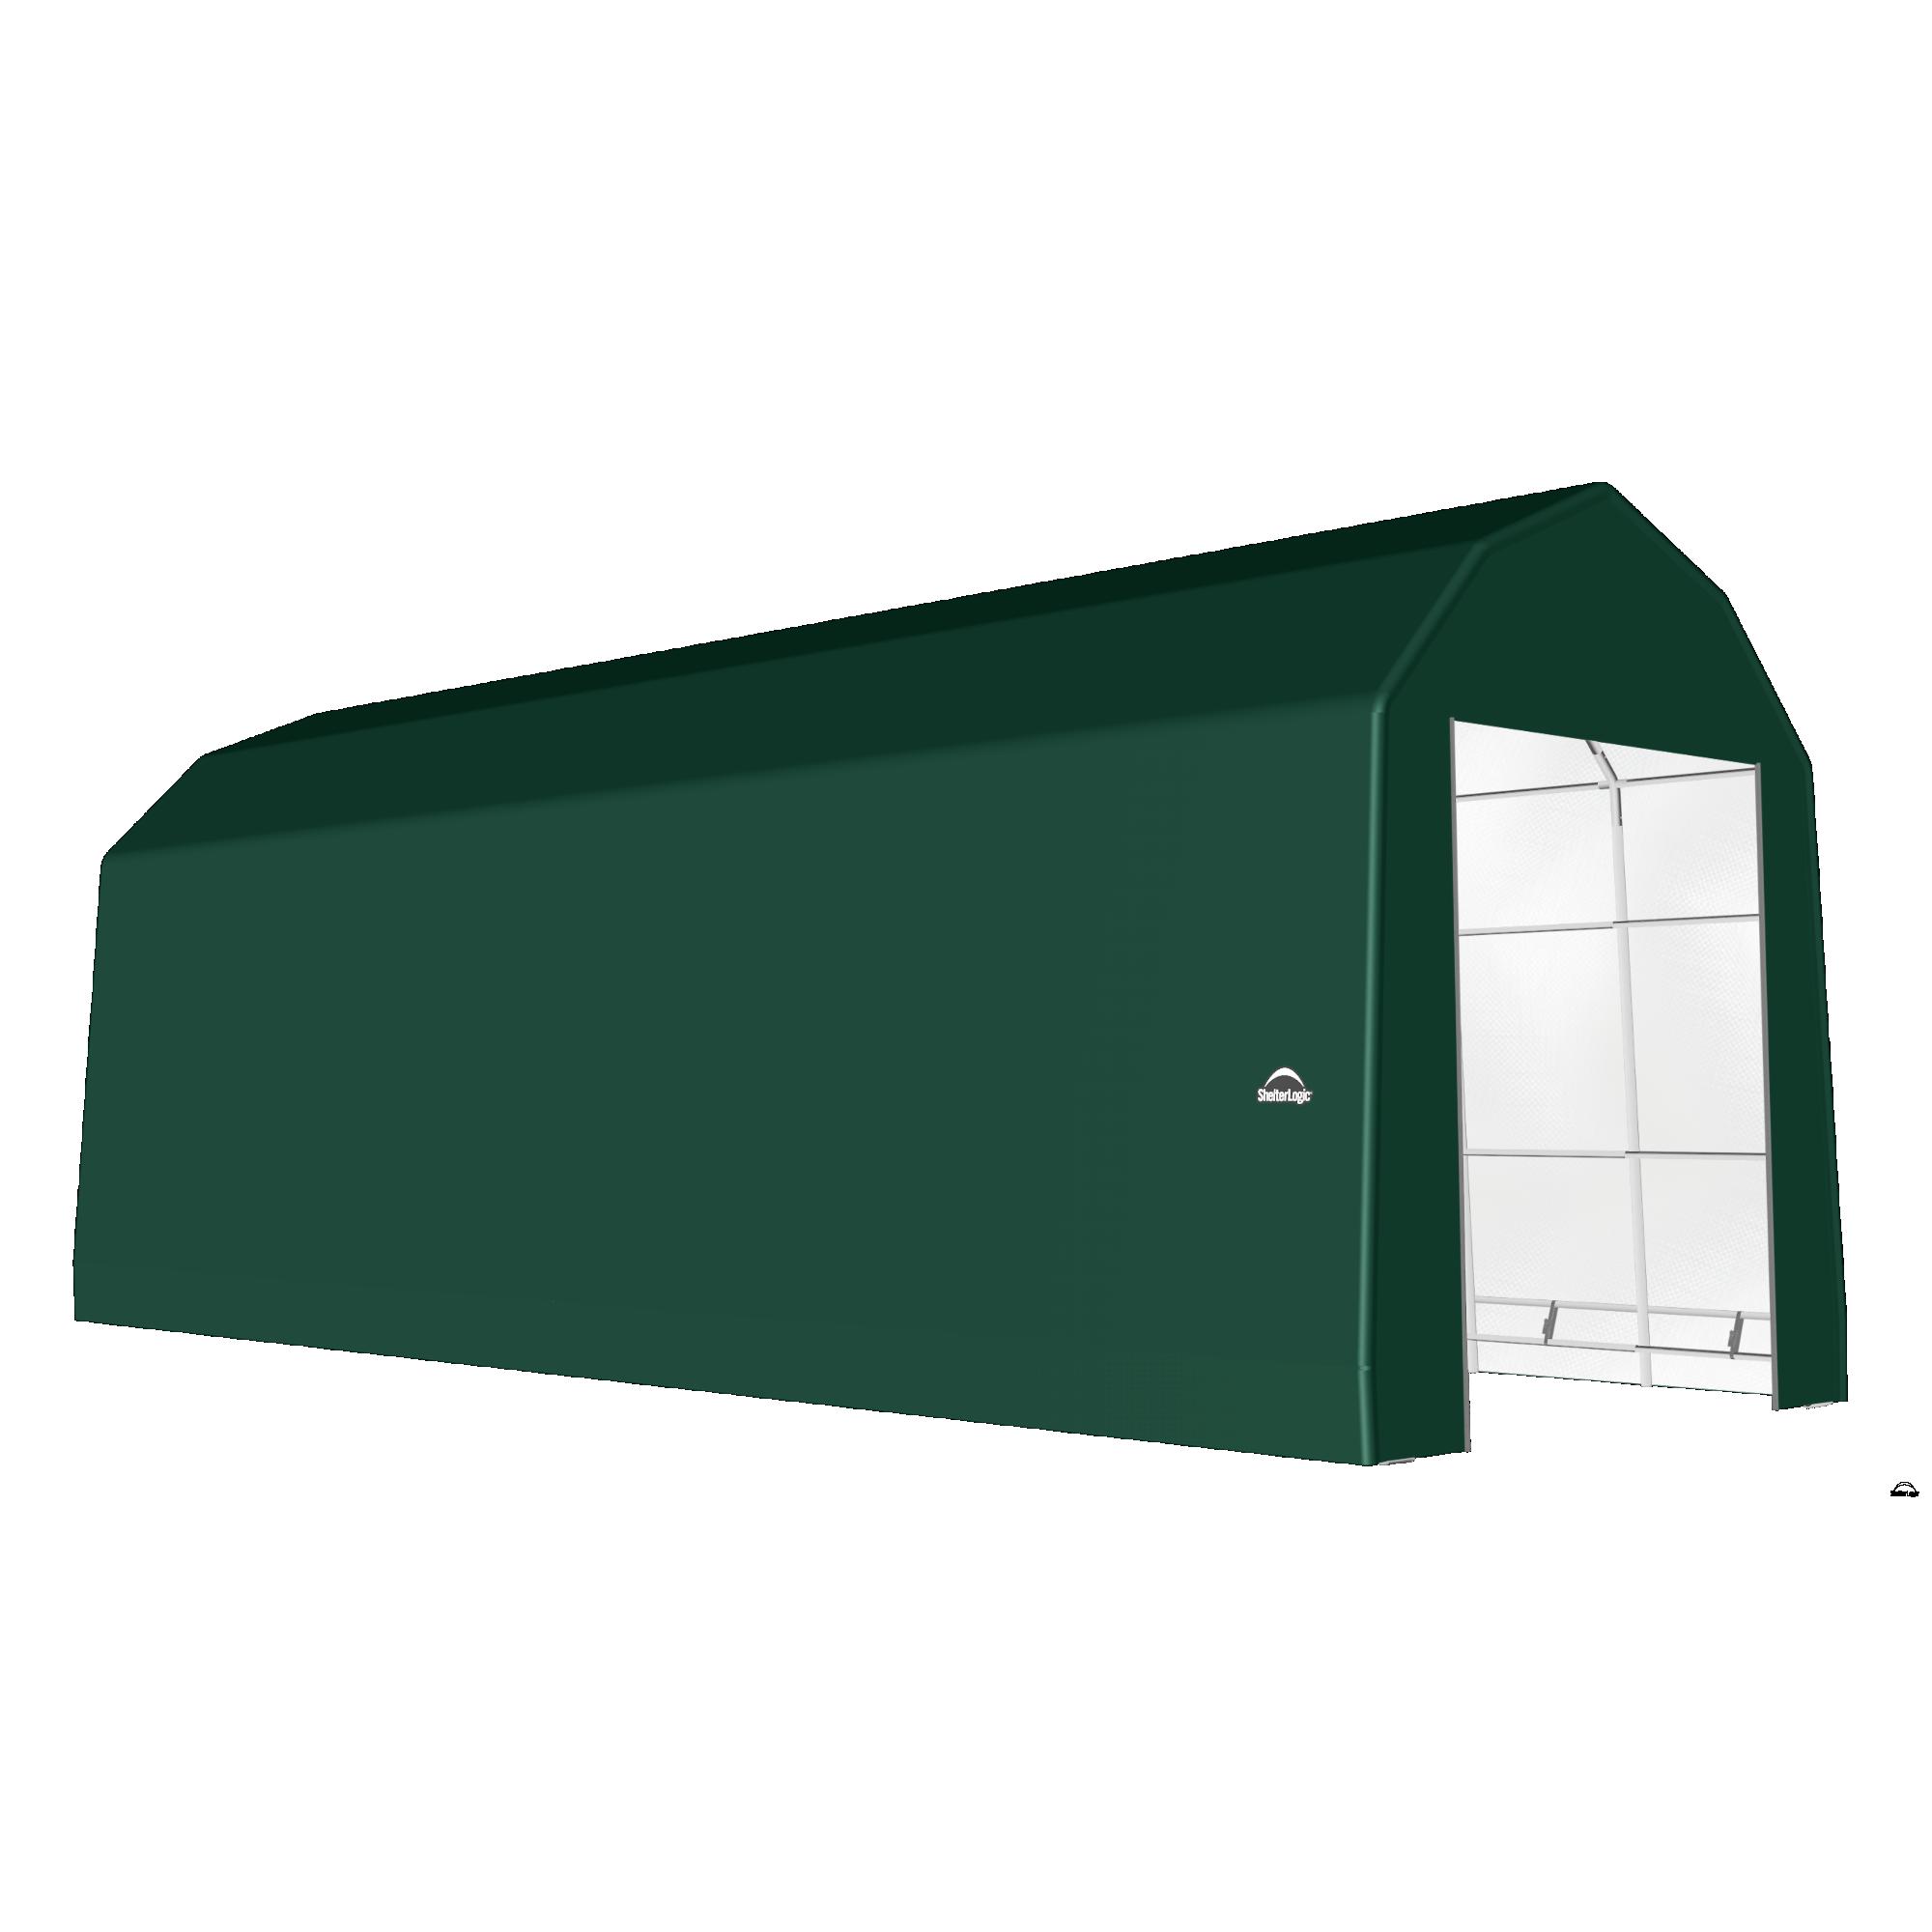 SP Barn 15X48X17 Green 14 oz PE Shelter